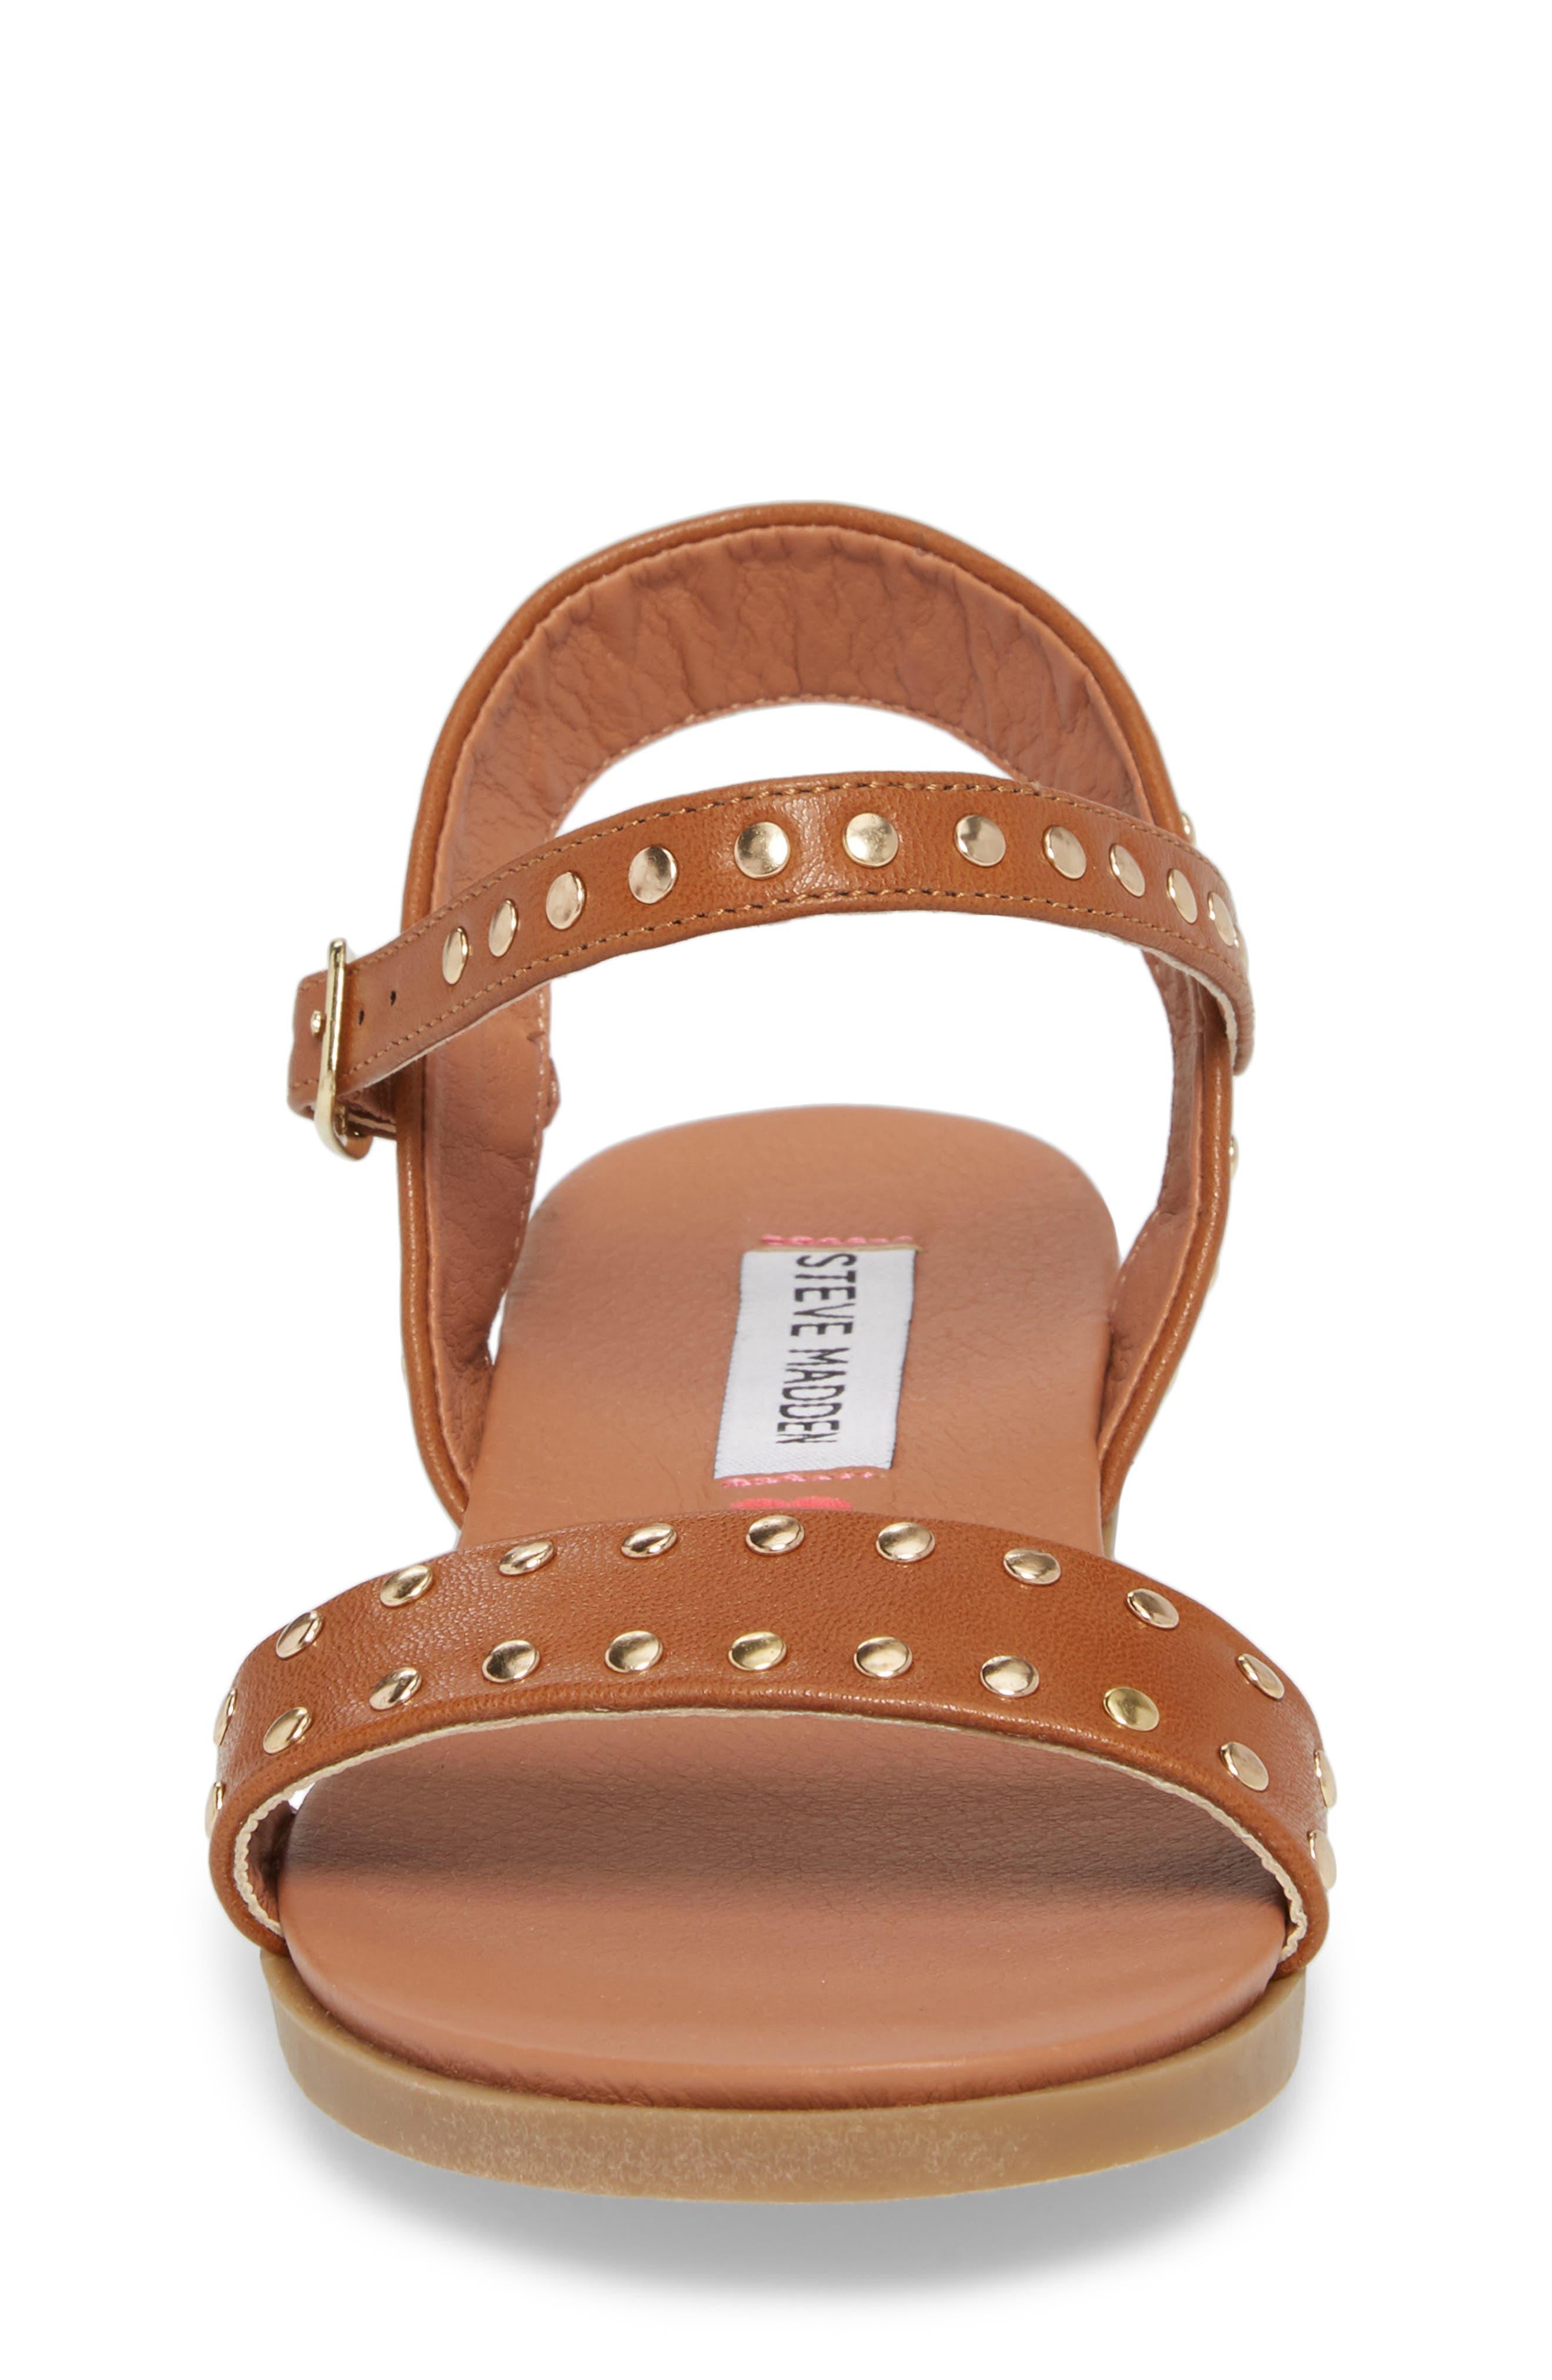 JDONDI Studded Sandal,                             Alternate thumbnail 4, color,                             Cognac